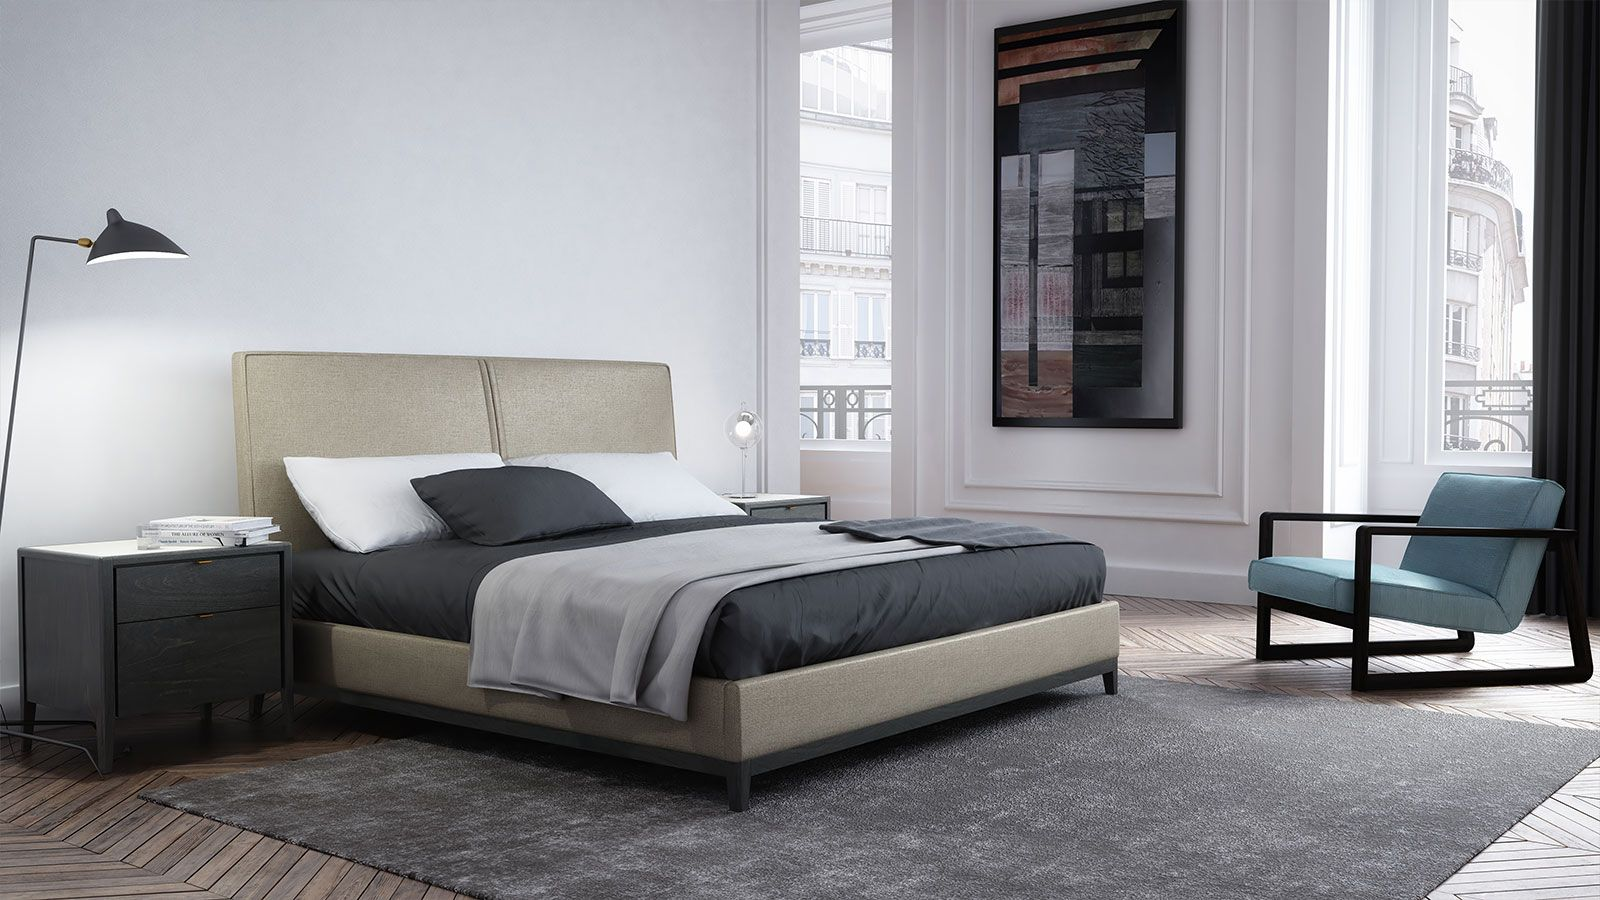 Manufacturier De Meubles Contemporain Huppe Top Quality Bedroom Furniture Modern Upholstered Beds Furniture